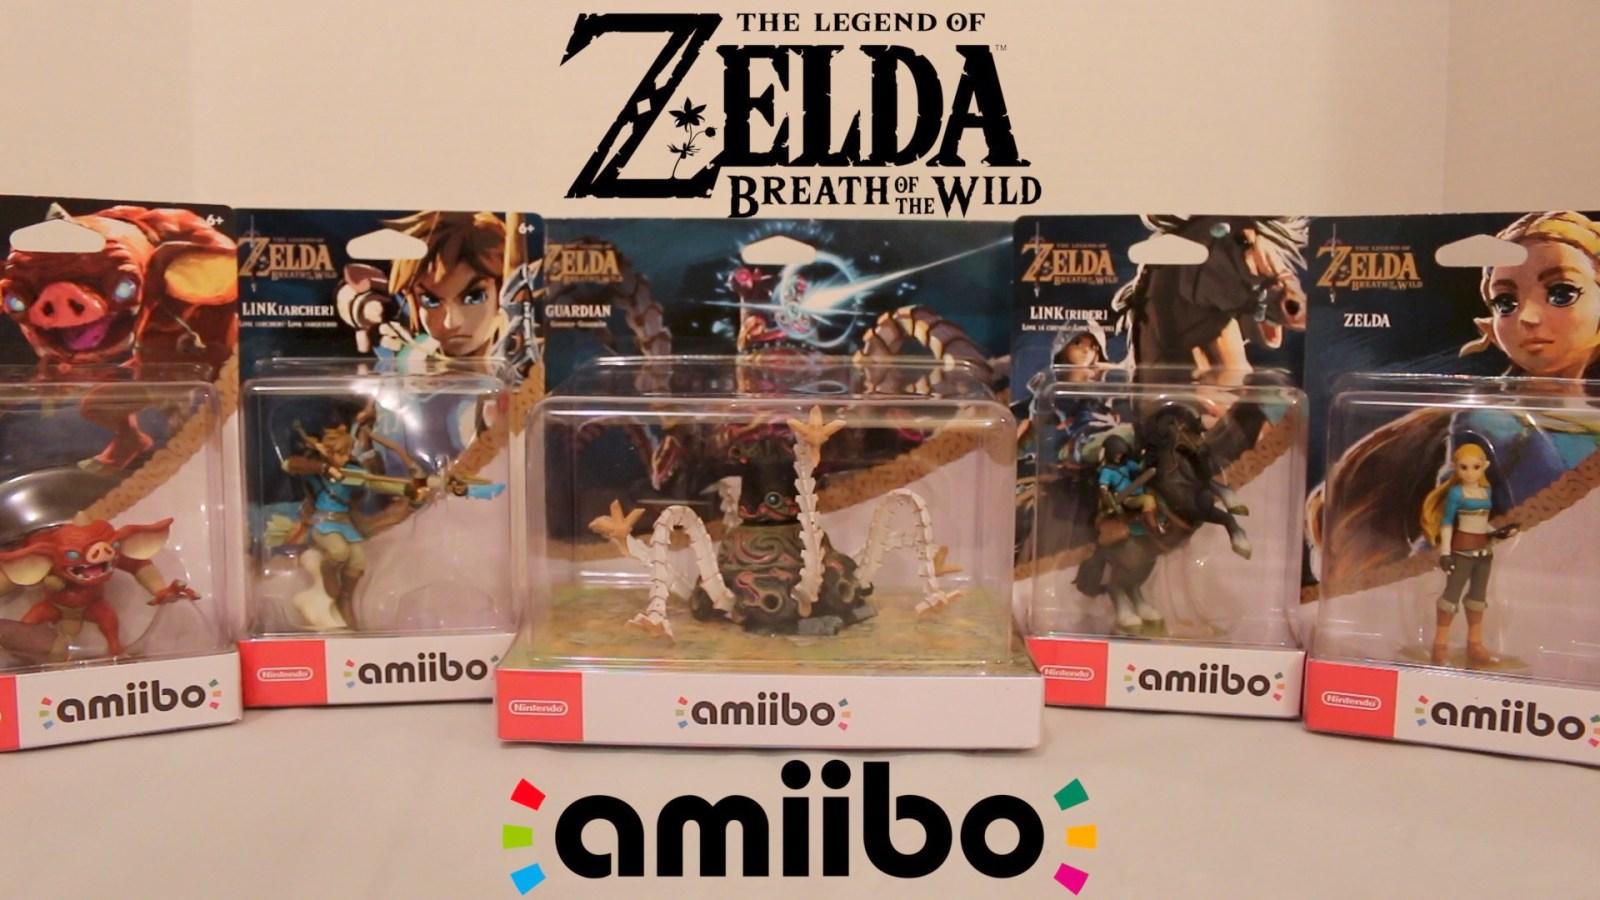 amiibo - NintendoFuse